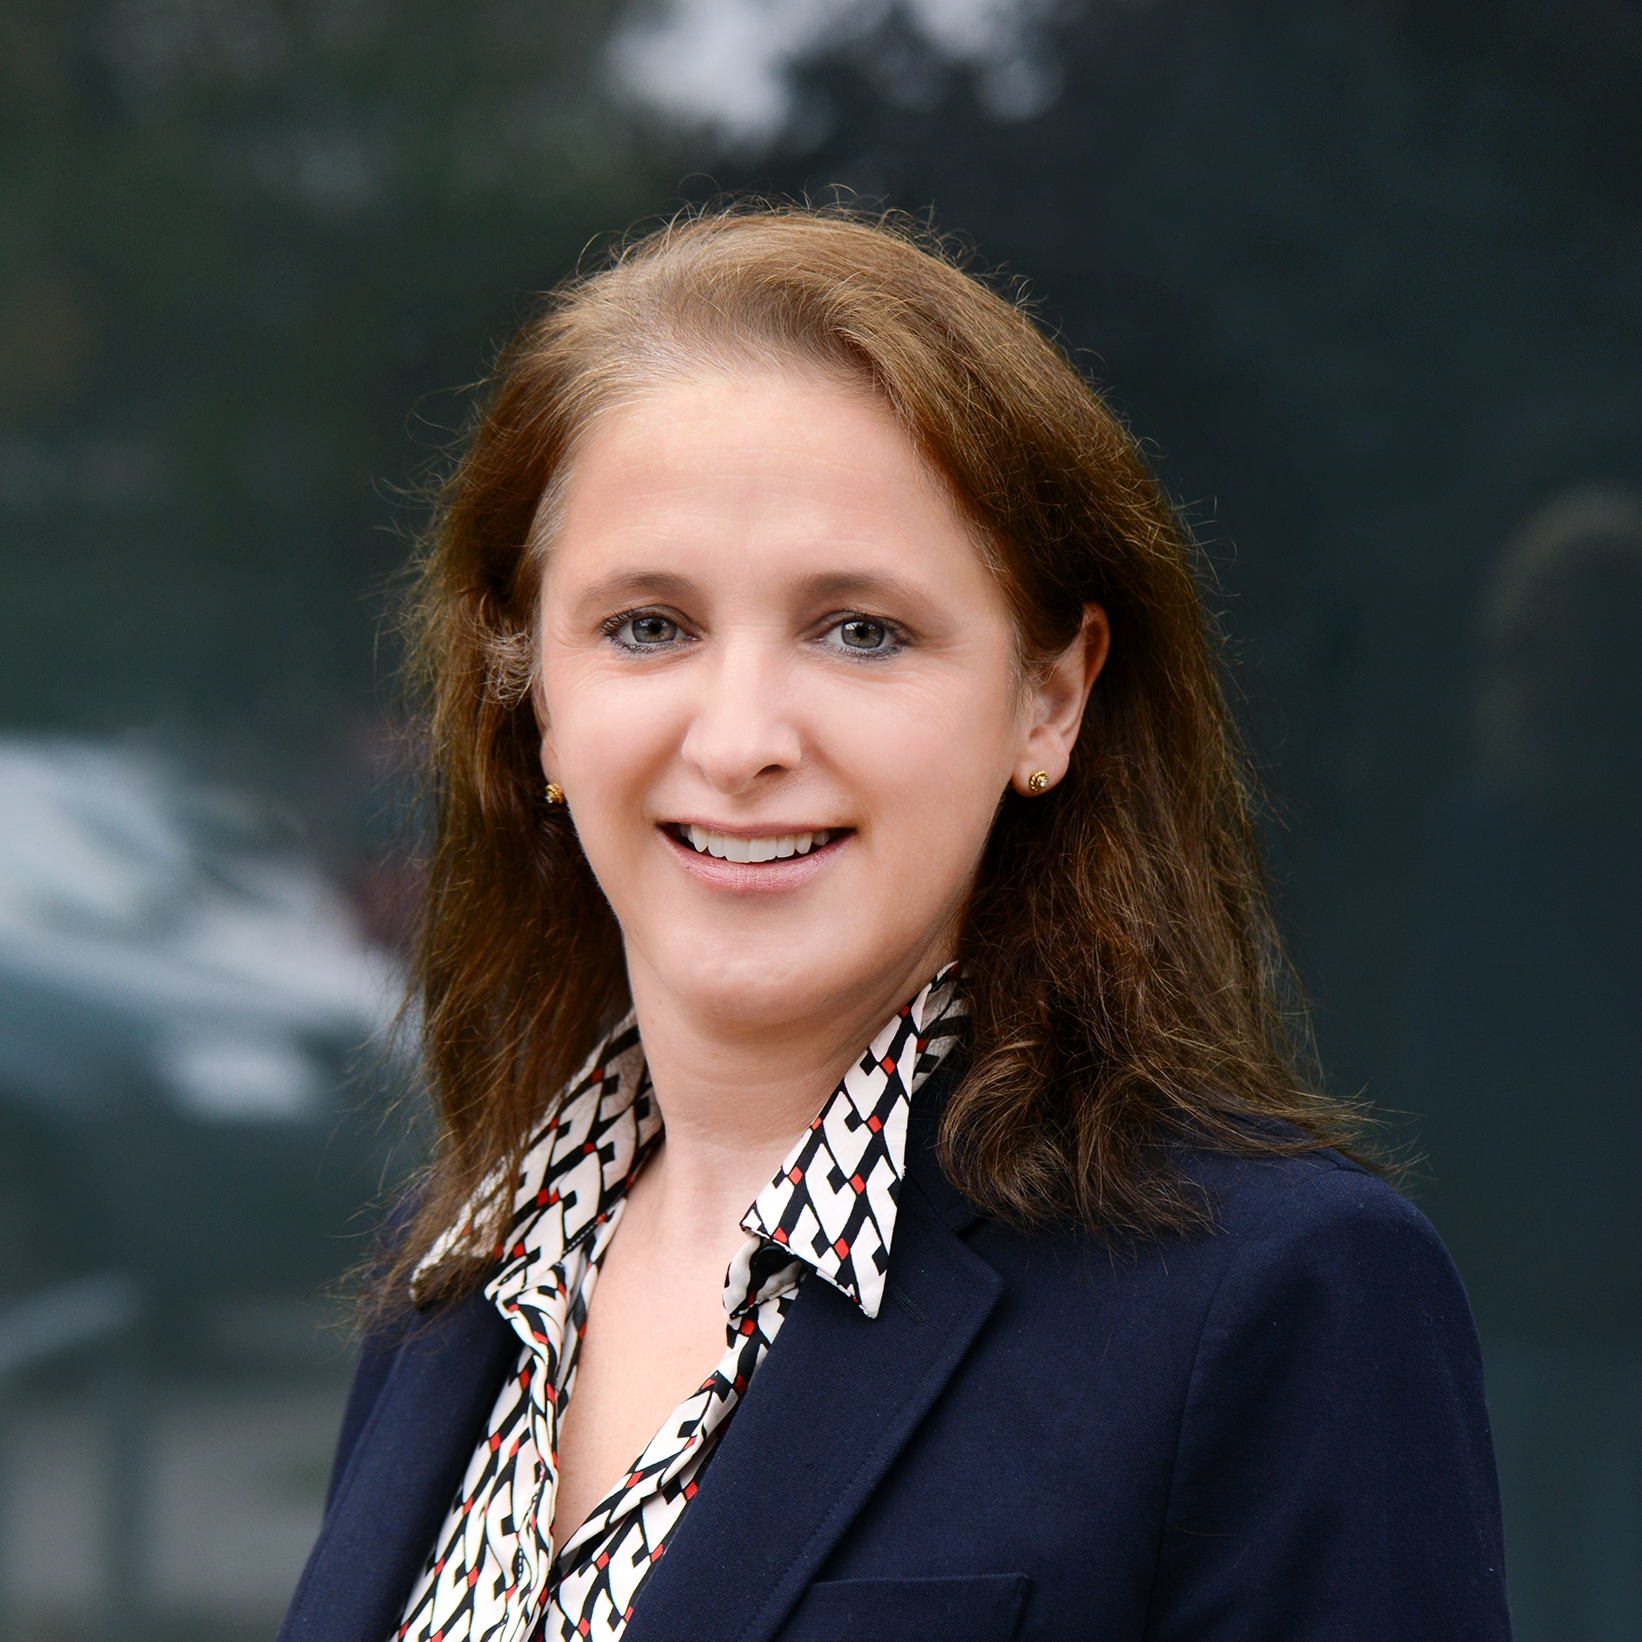 Prof. Dr. Susan Harris-Huemmert